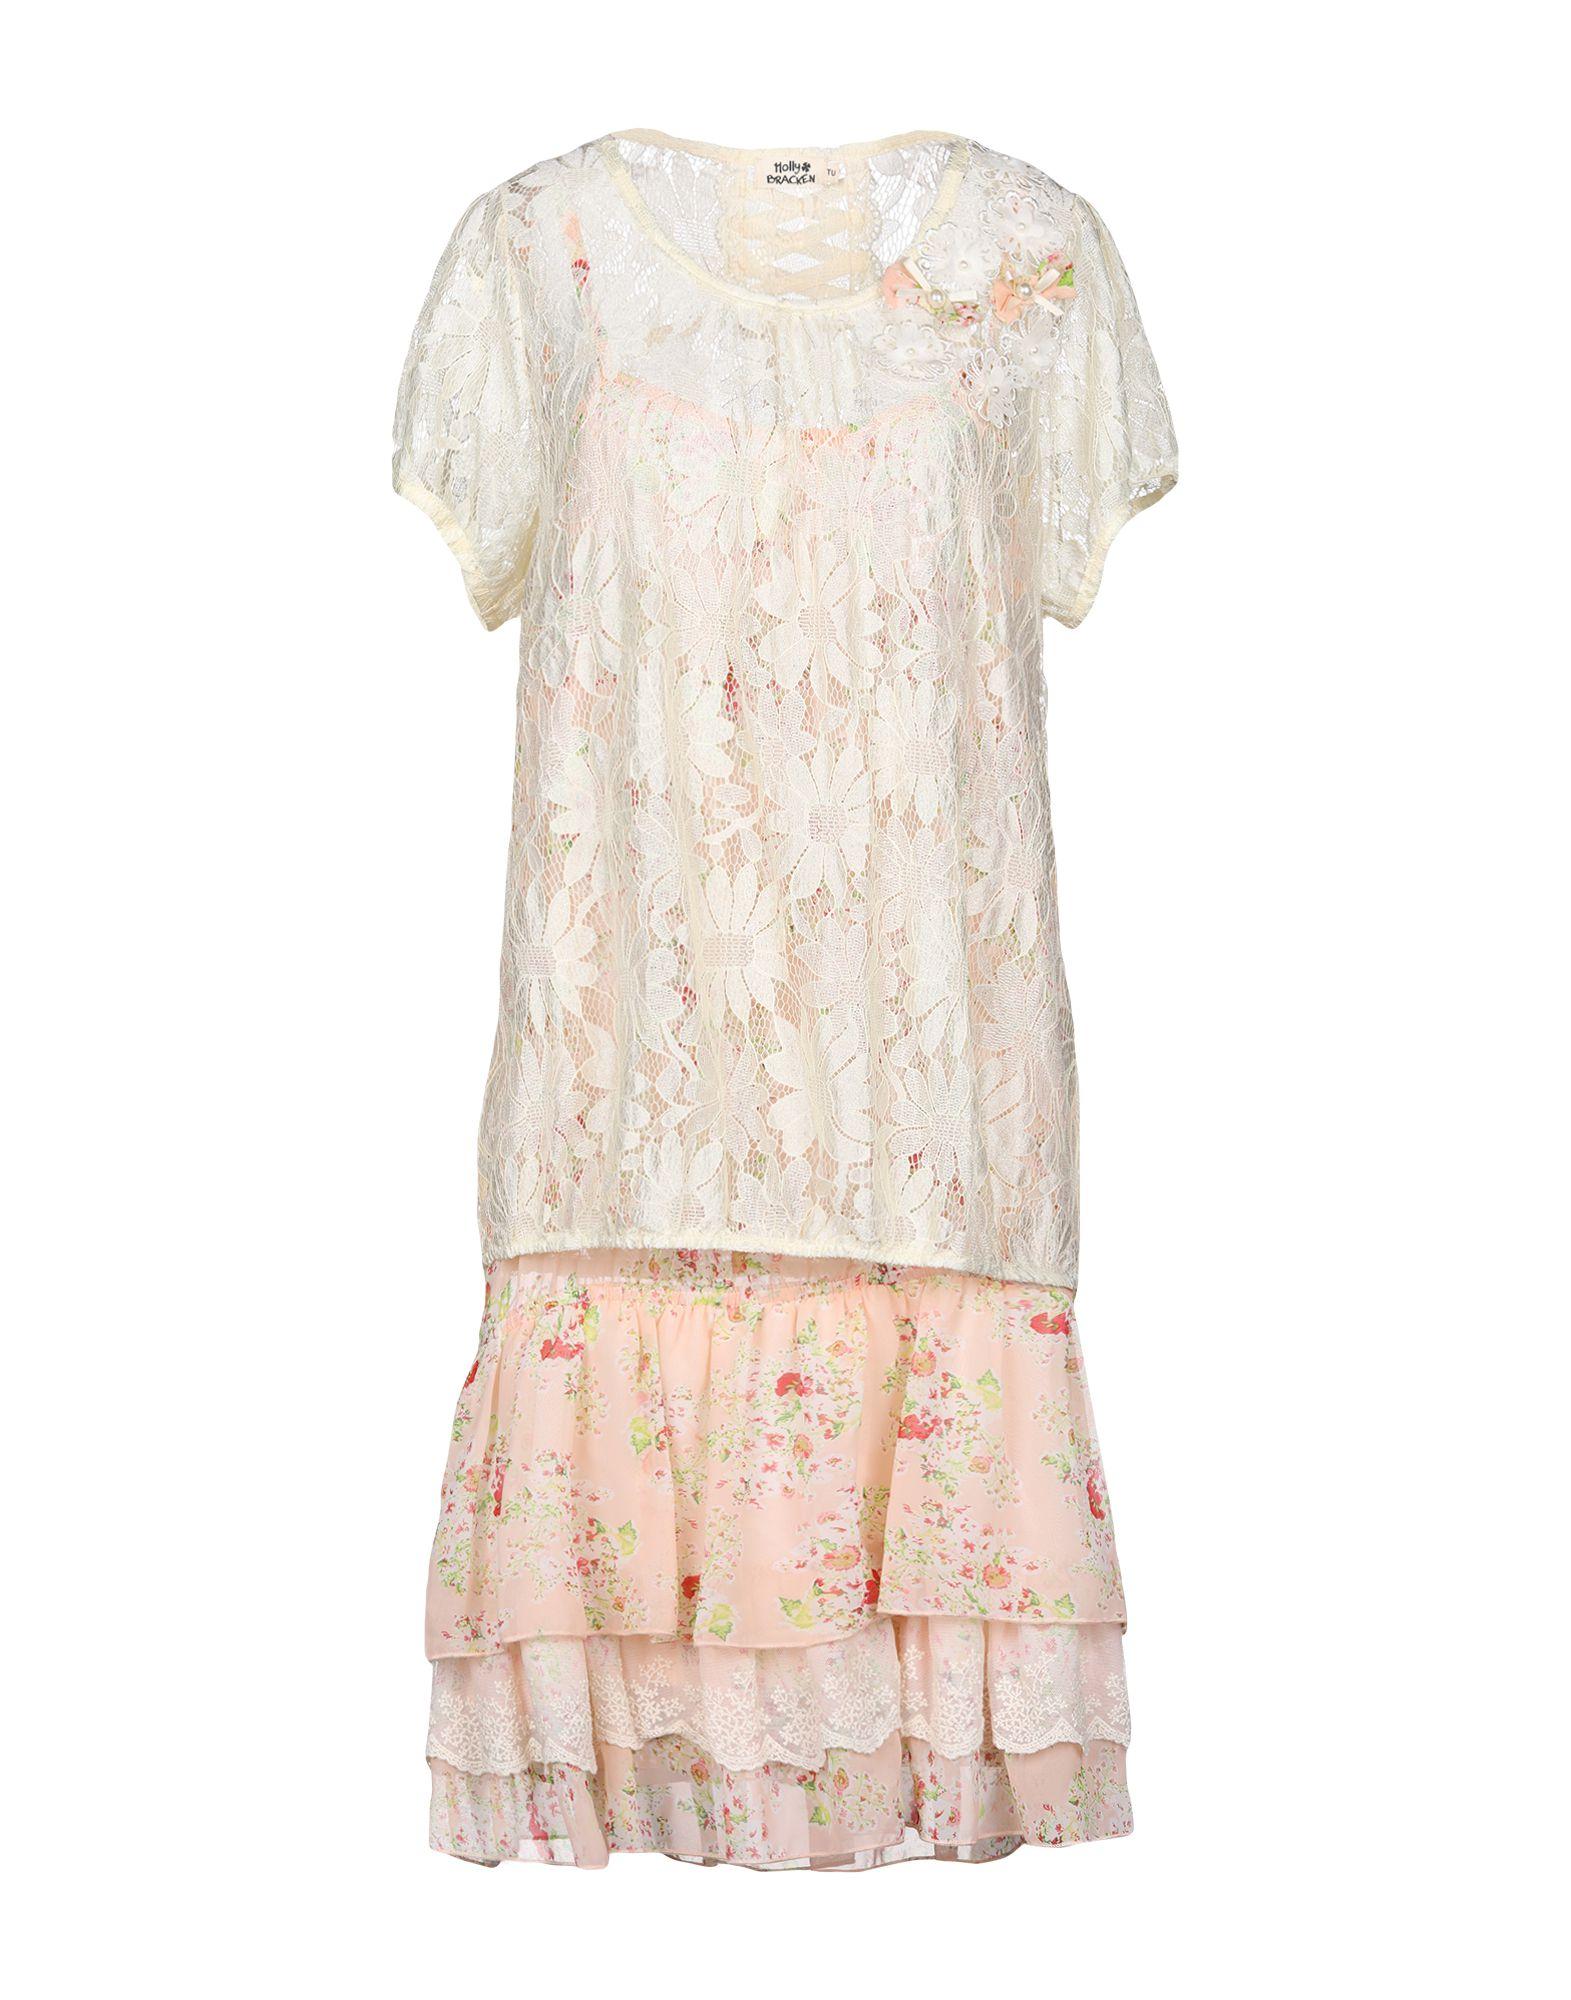 MOLLY BRACKEN Платье до колена odd molly платье до колена